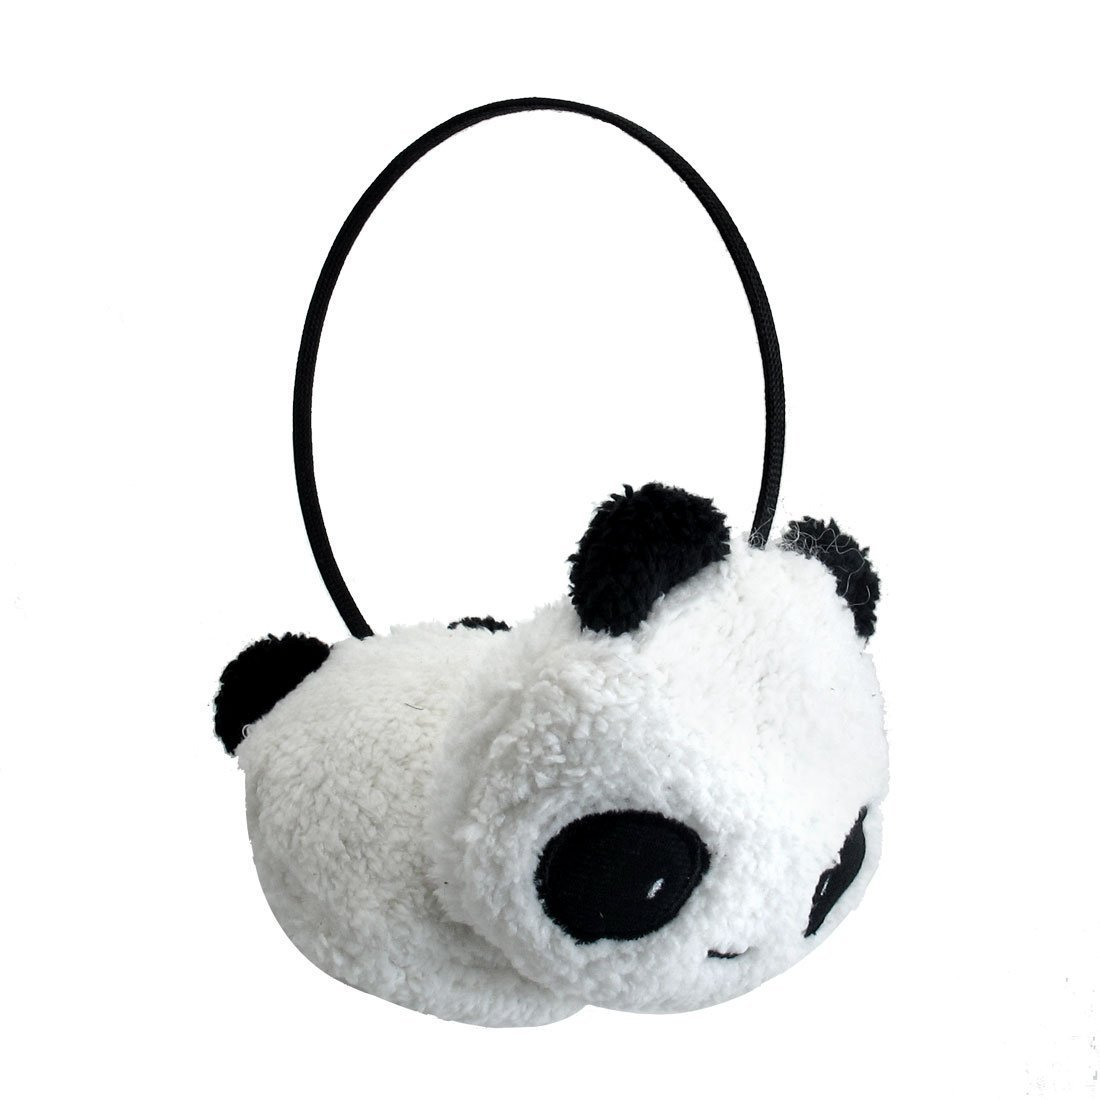 BUYEONLINE Girls Black White Small Panda Design Pad Fluffy Ear Warmer Earmuffs